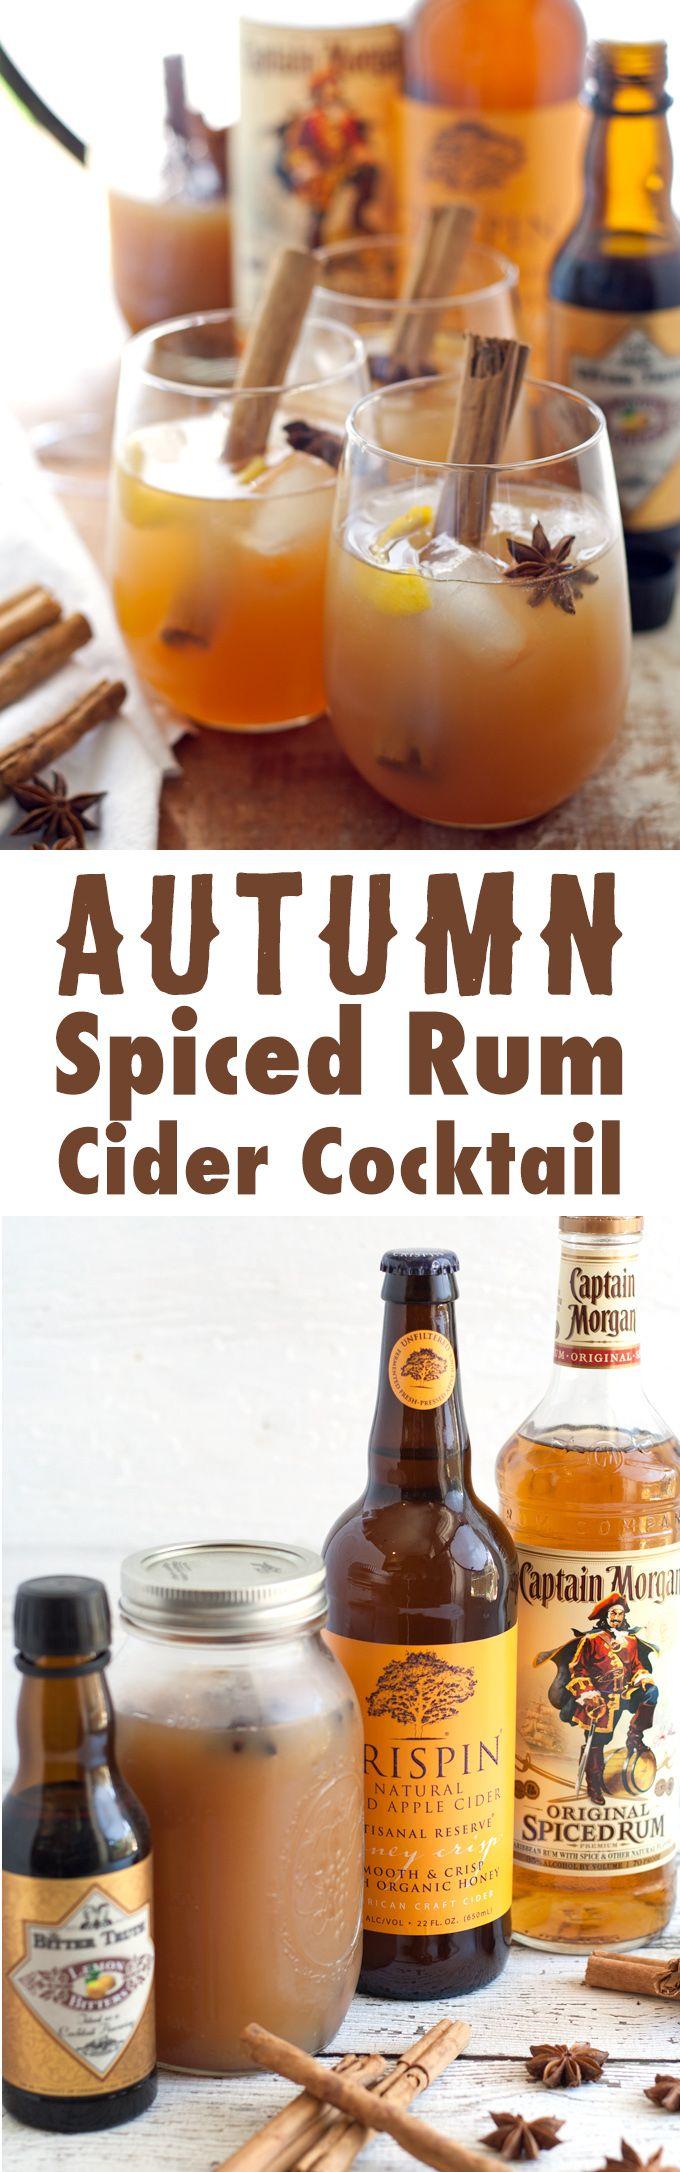 Autumn Spiced Rum Cider Cocktail